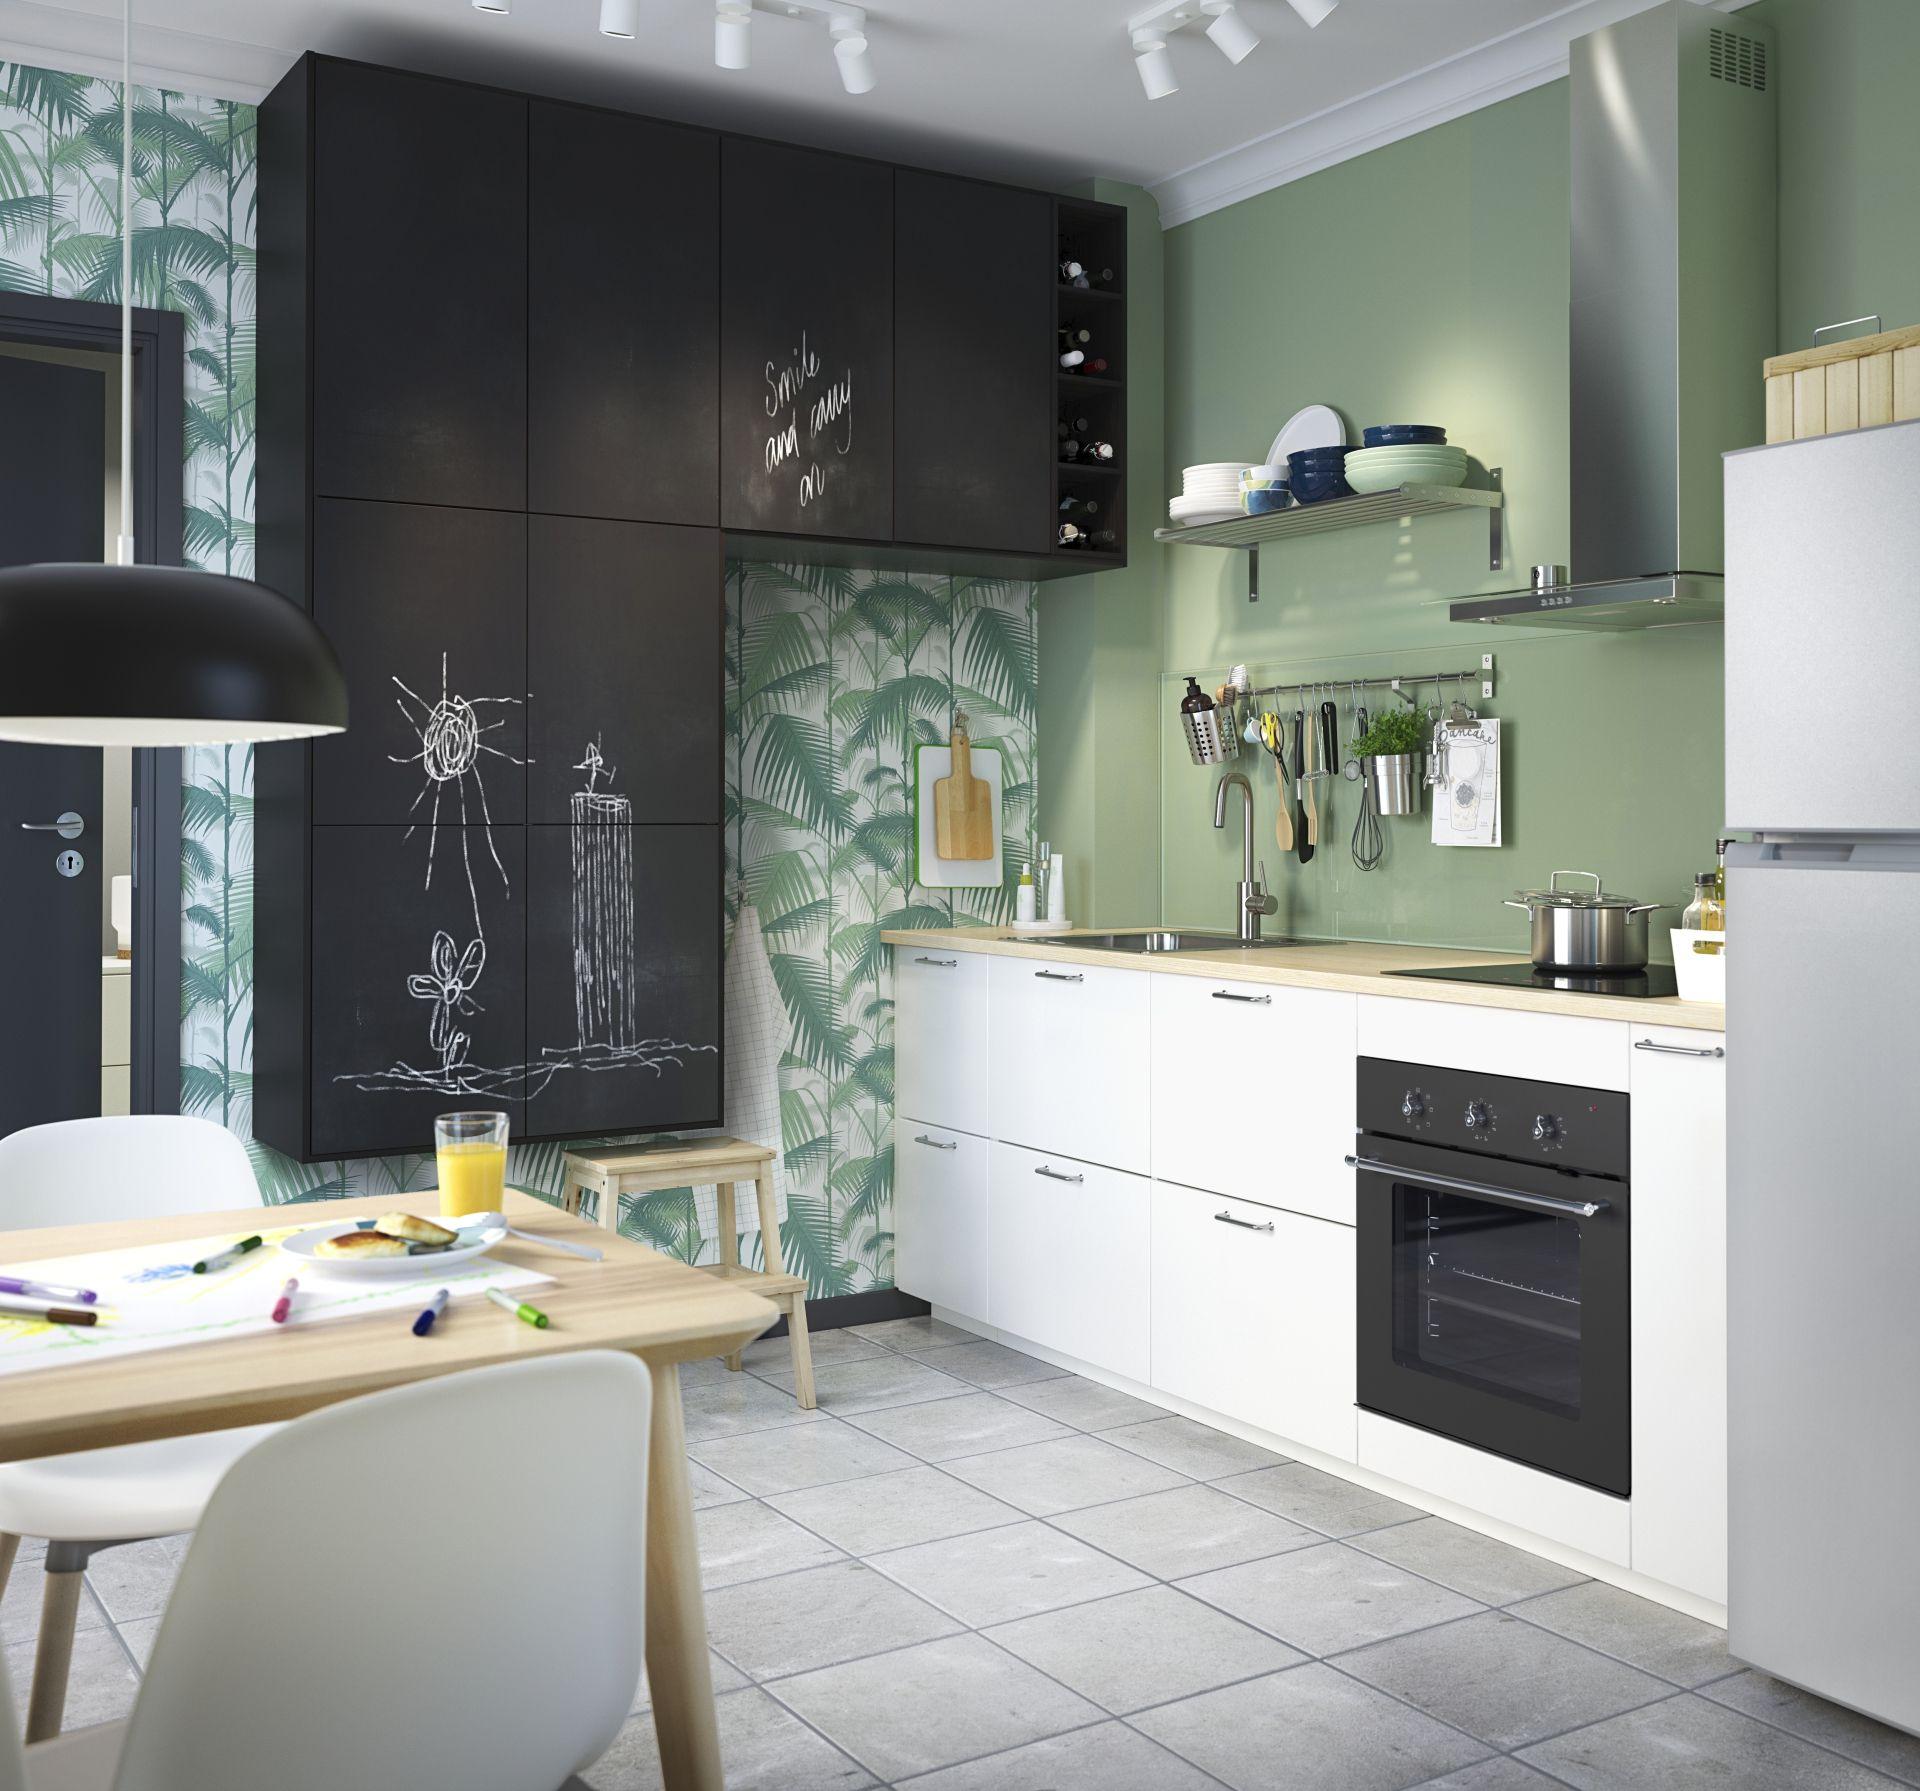 Veddinge Ladefront Grijs Kitchen Ikea Keuken Rvs Keuken En Ikea